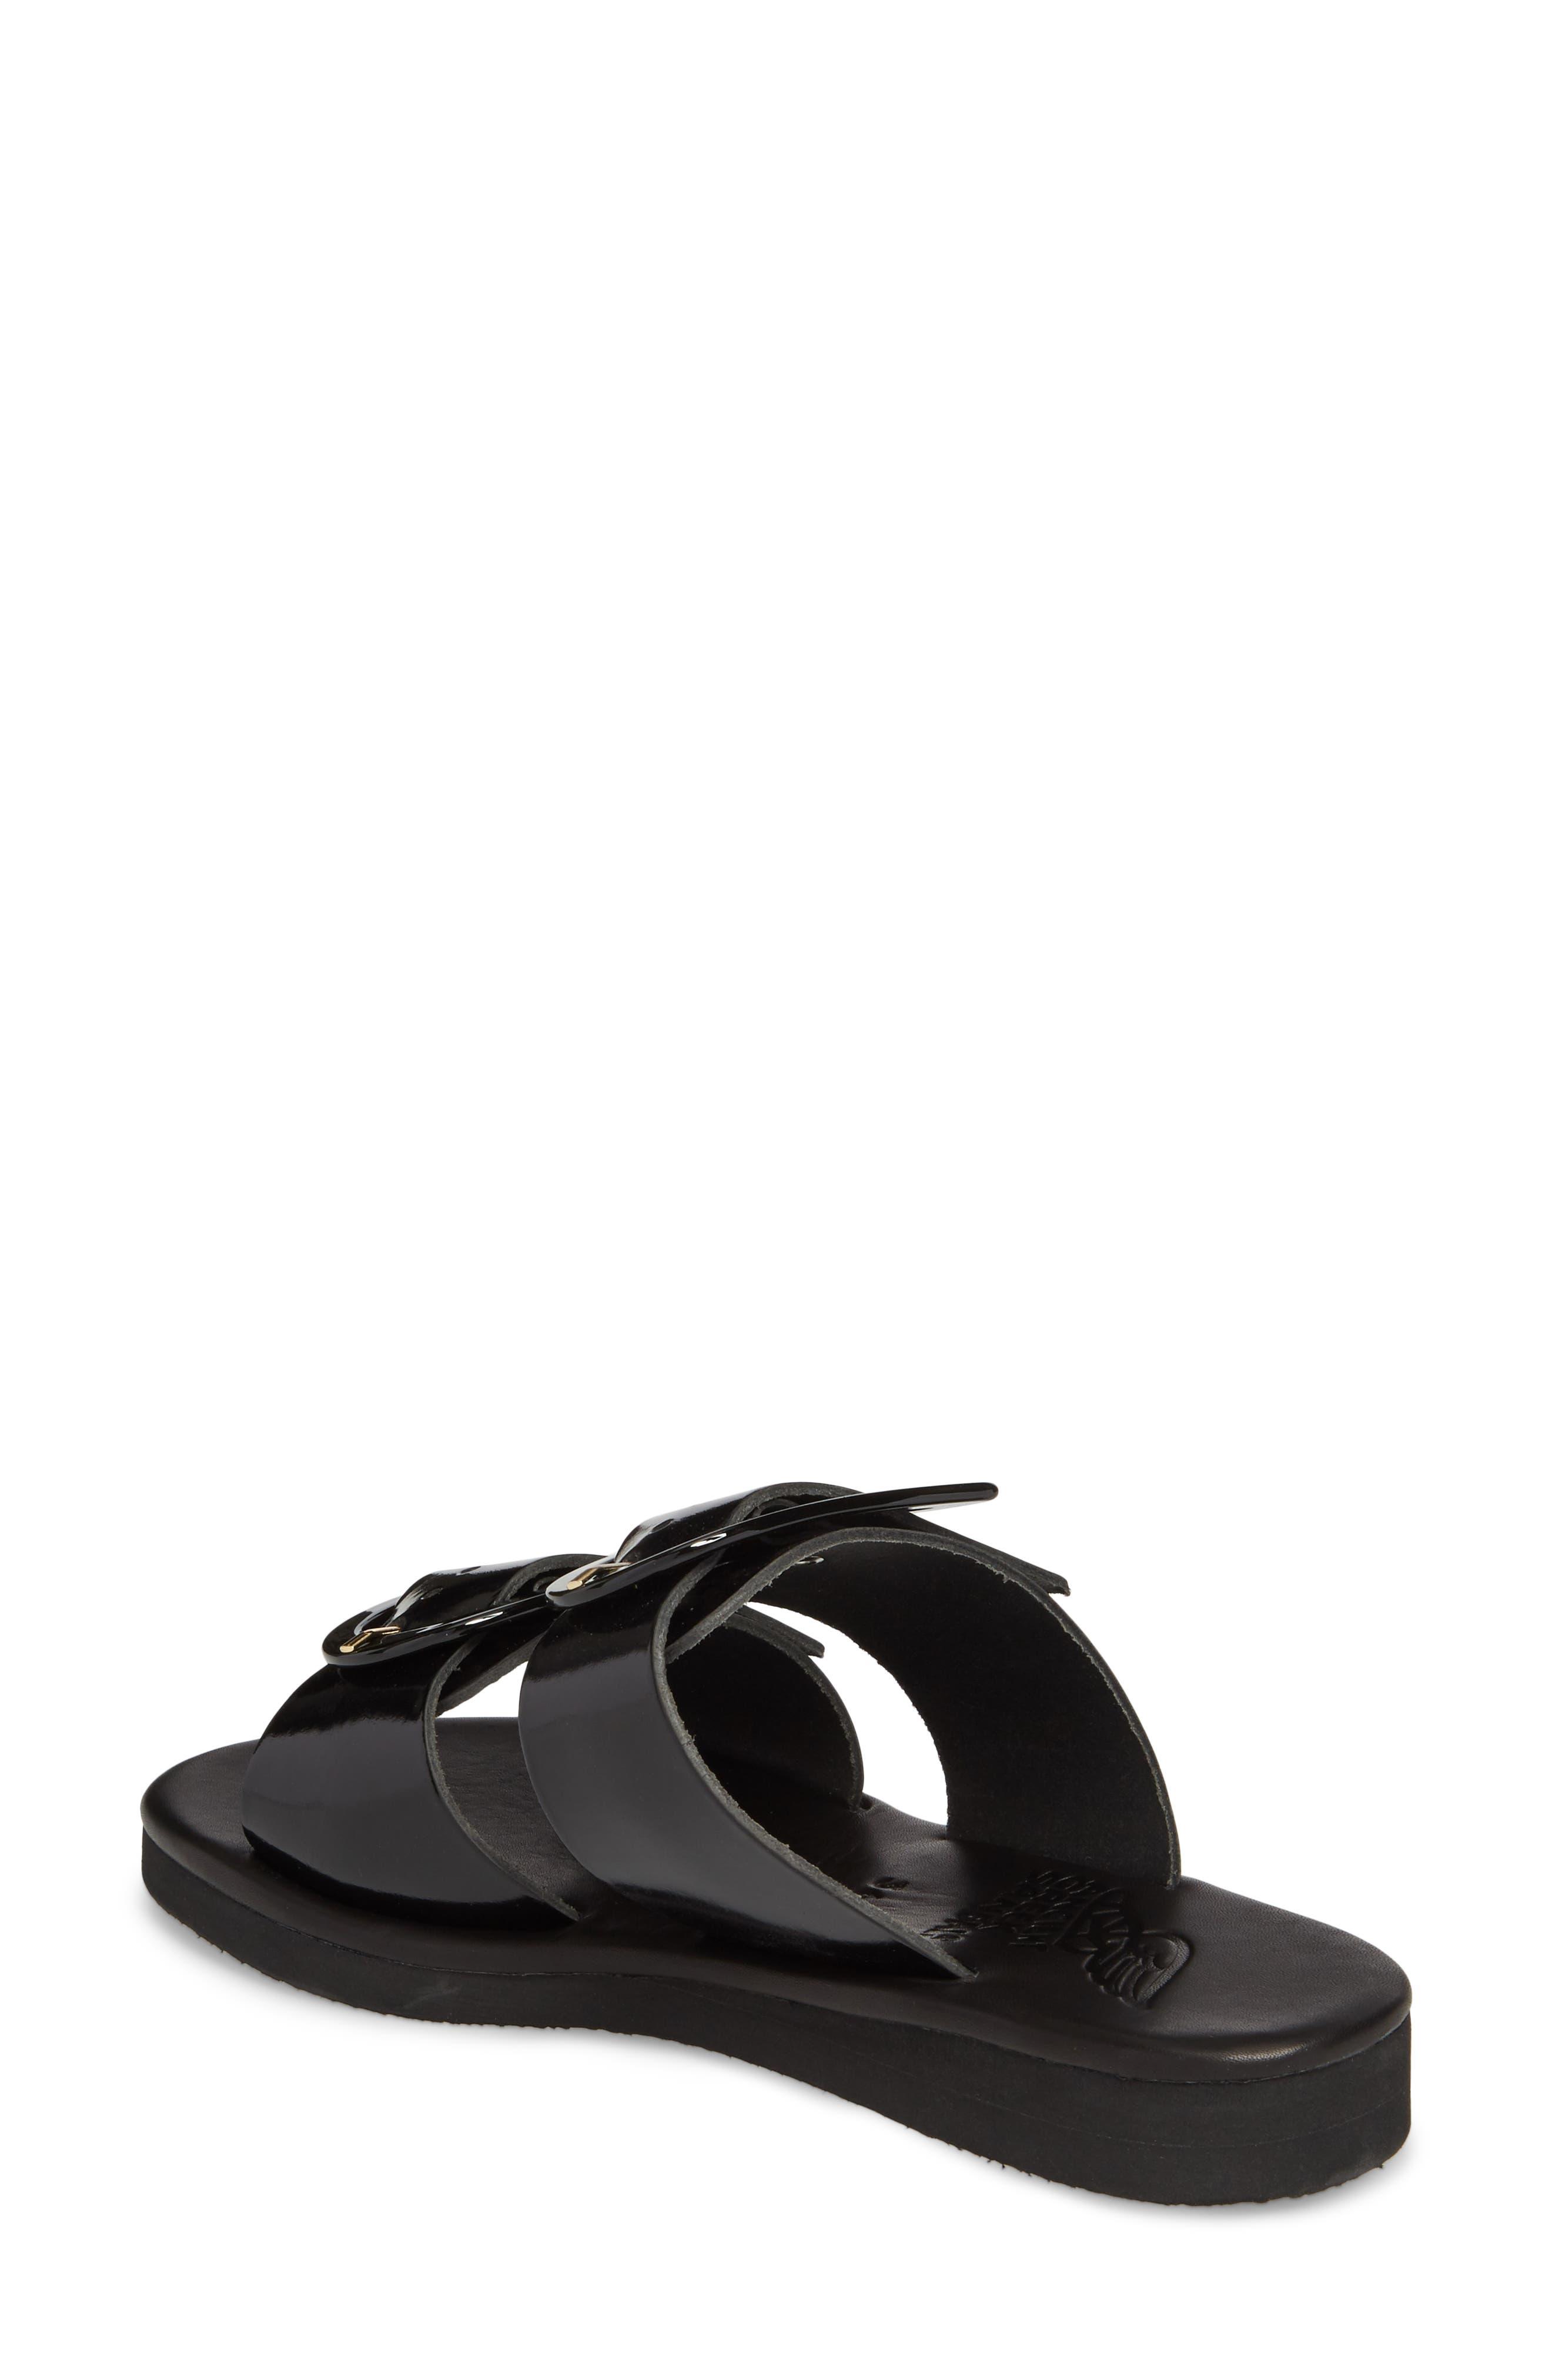 Iaso Slide Sandal,                             Alternate thumbnail 2, color,                             Black